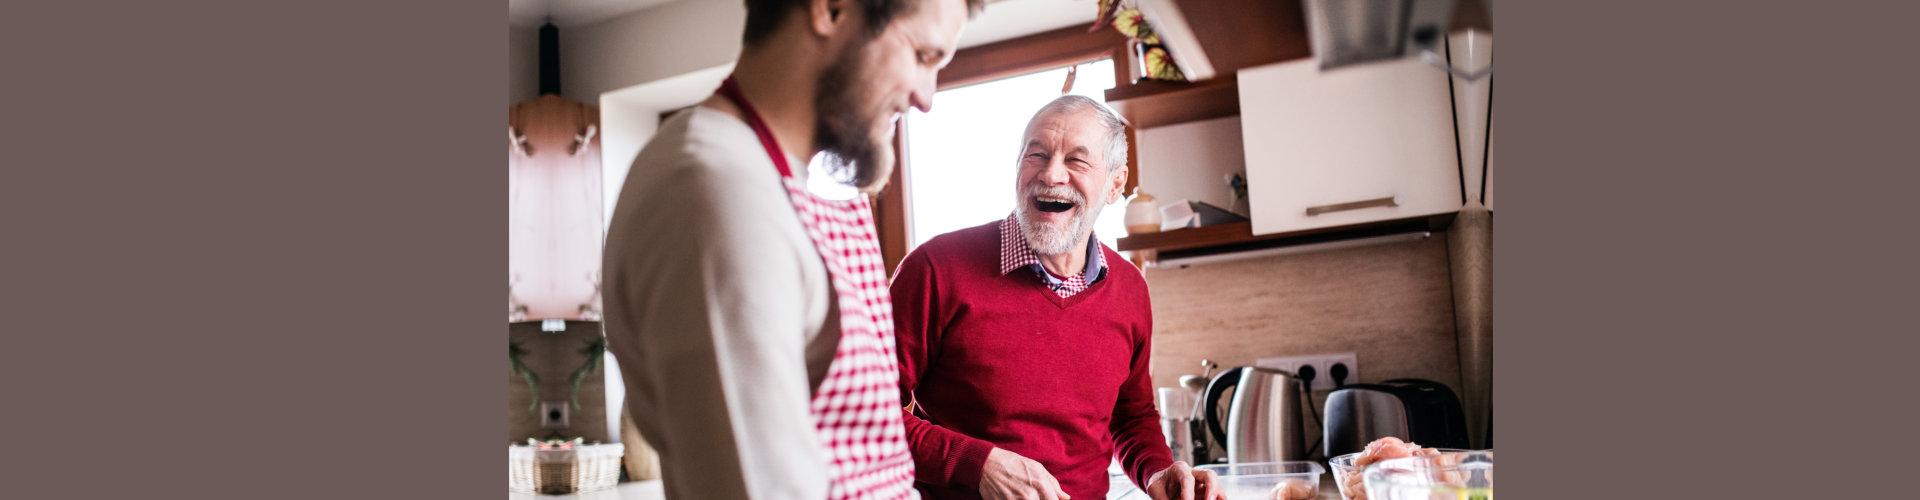 senior man and a caregiver cooking